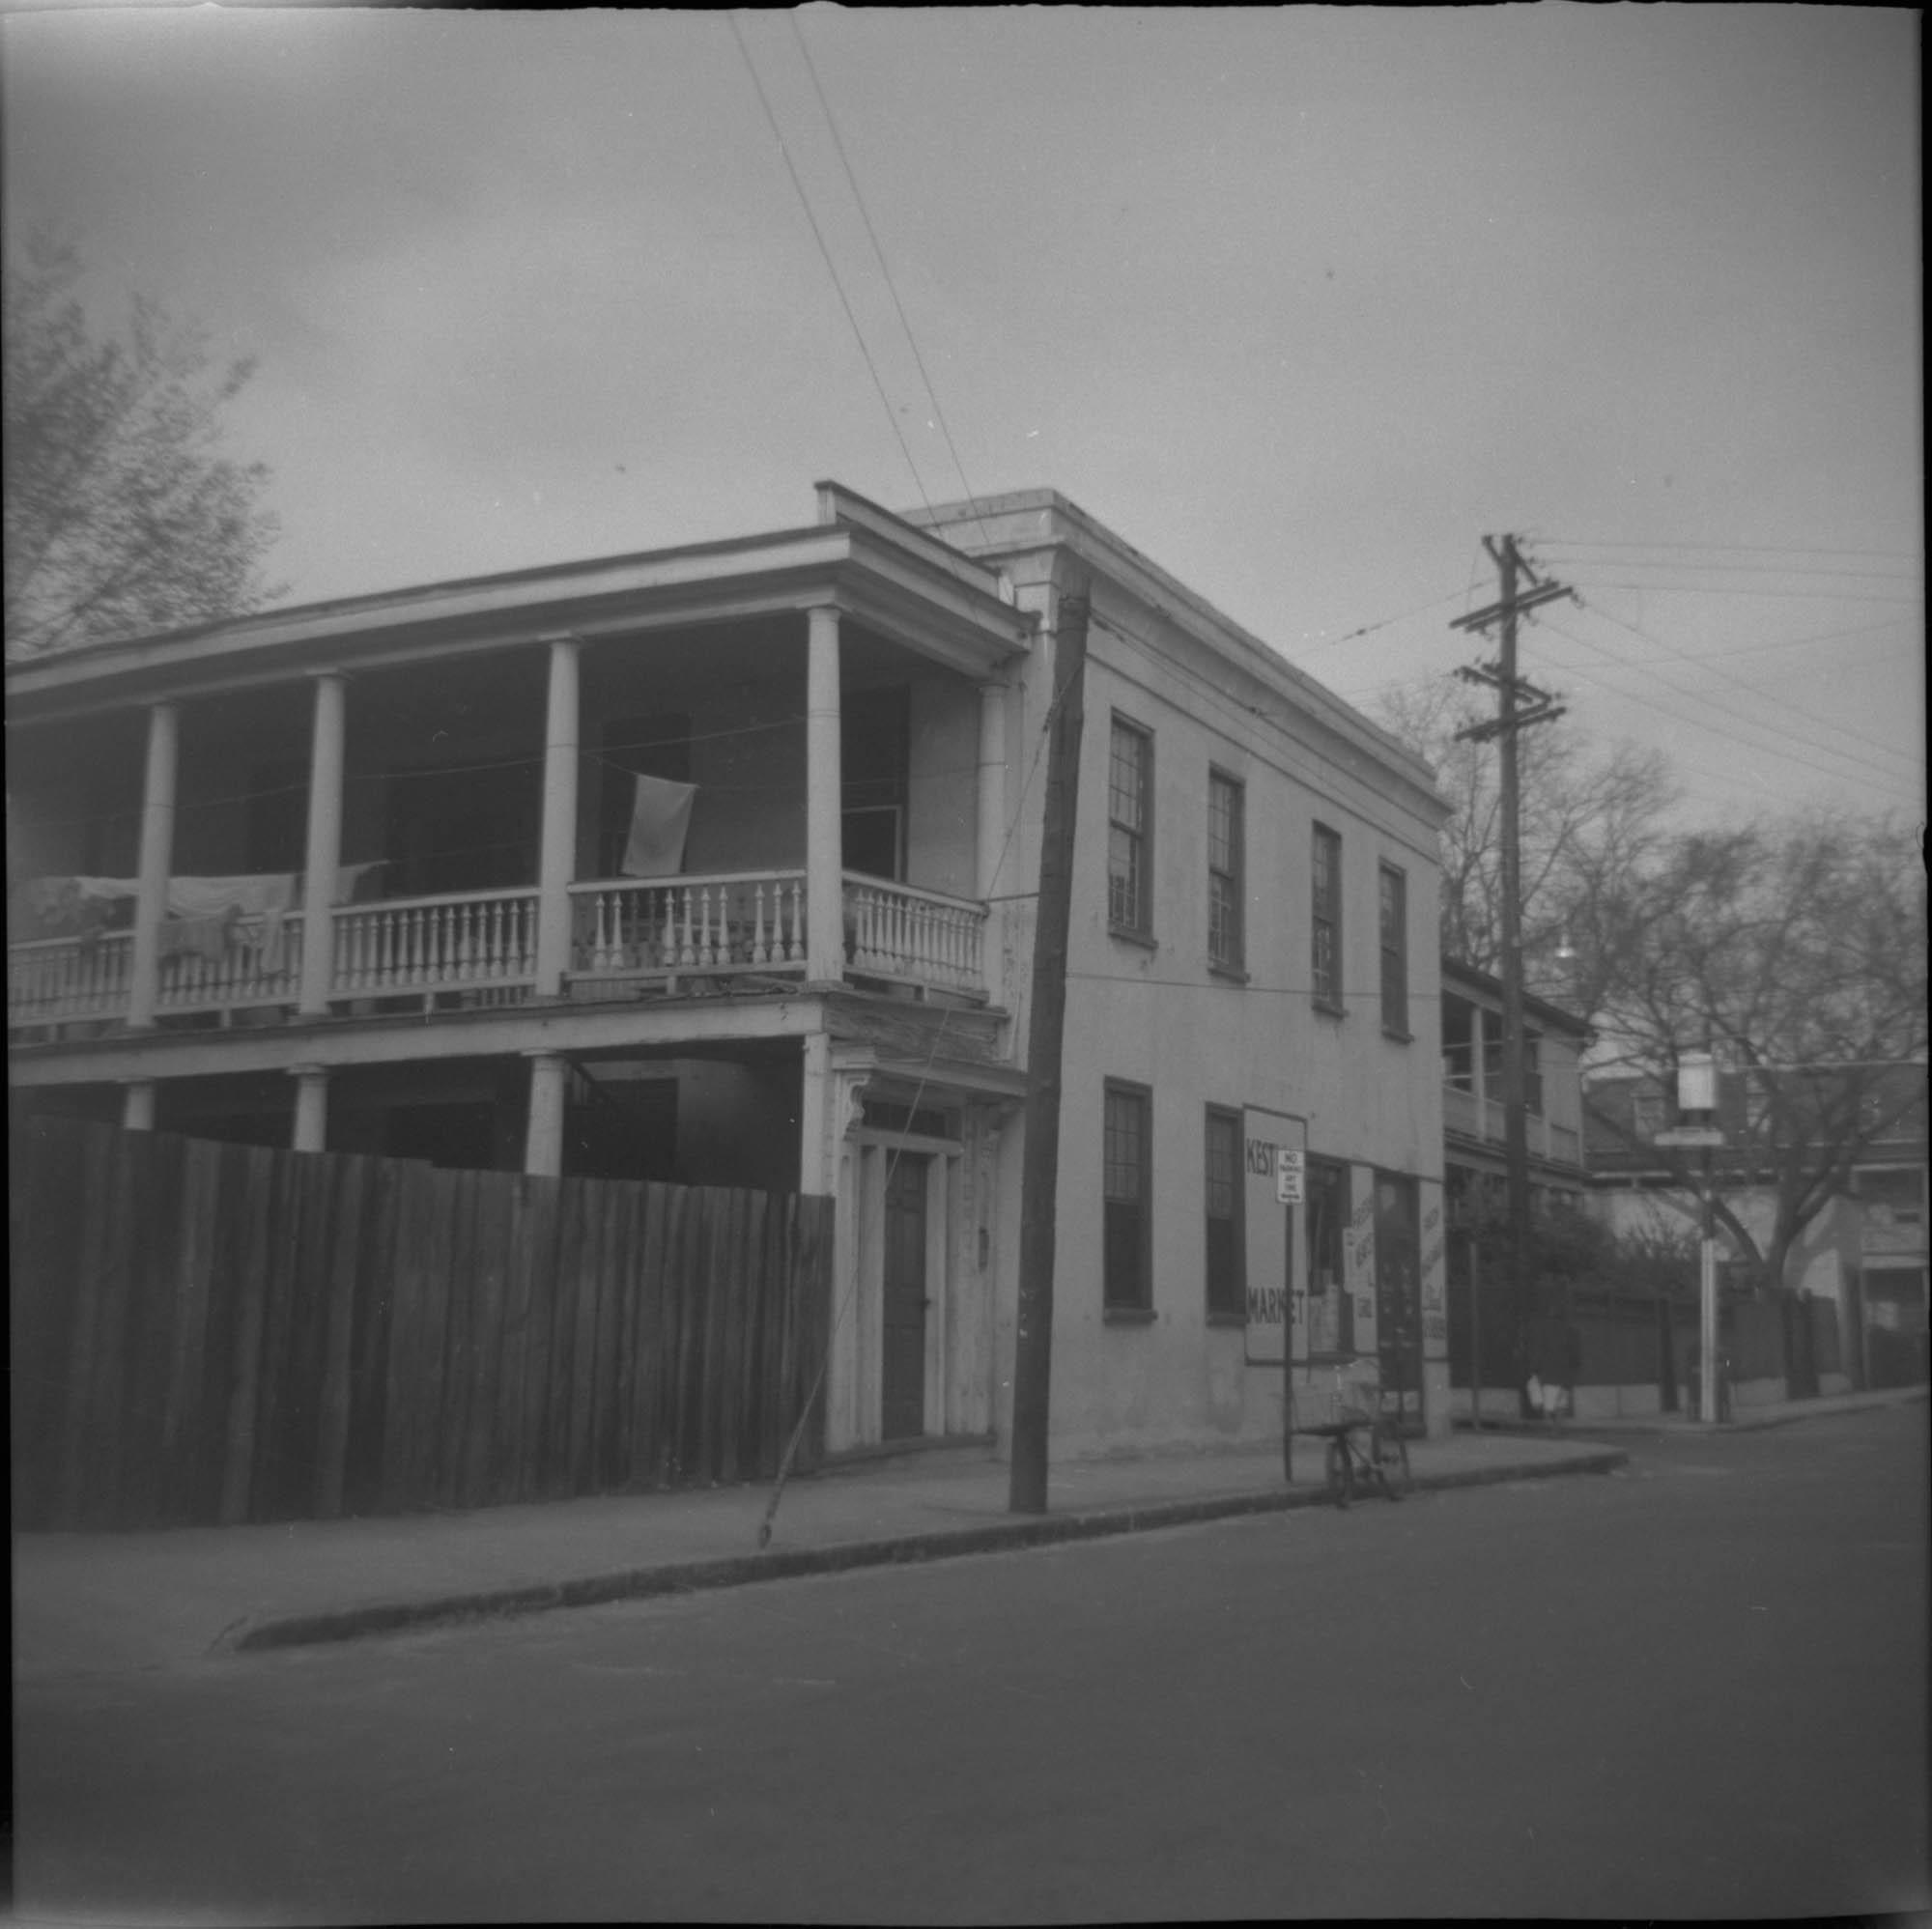 48 Society Street